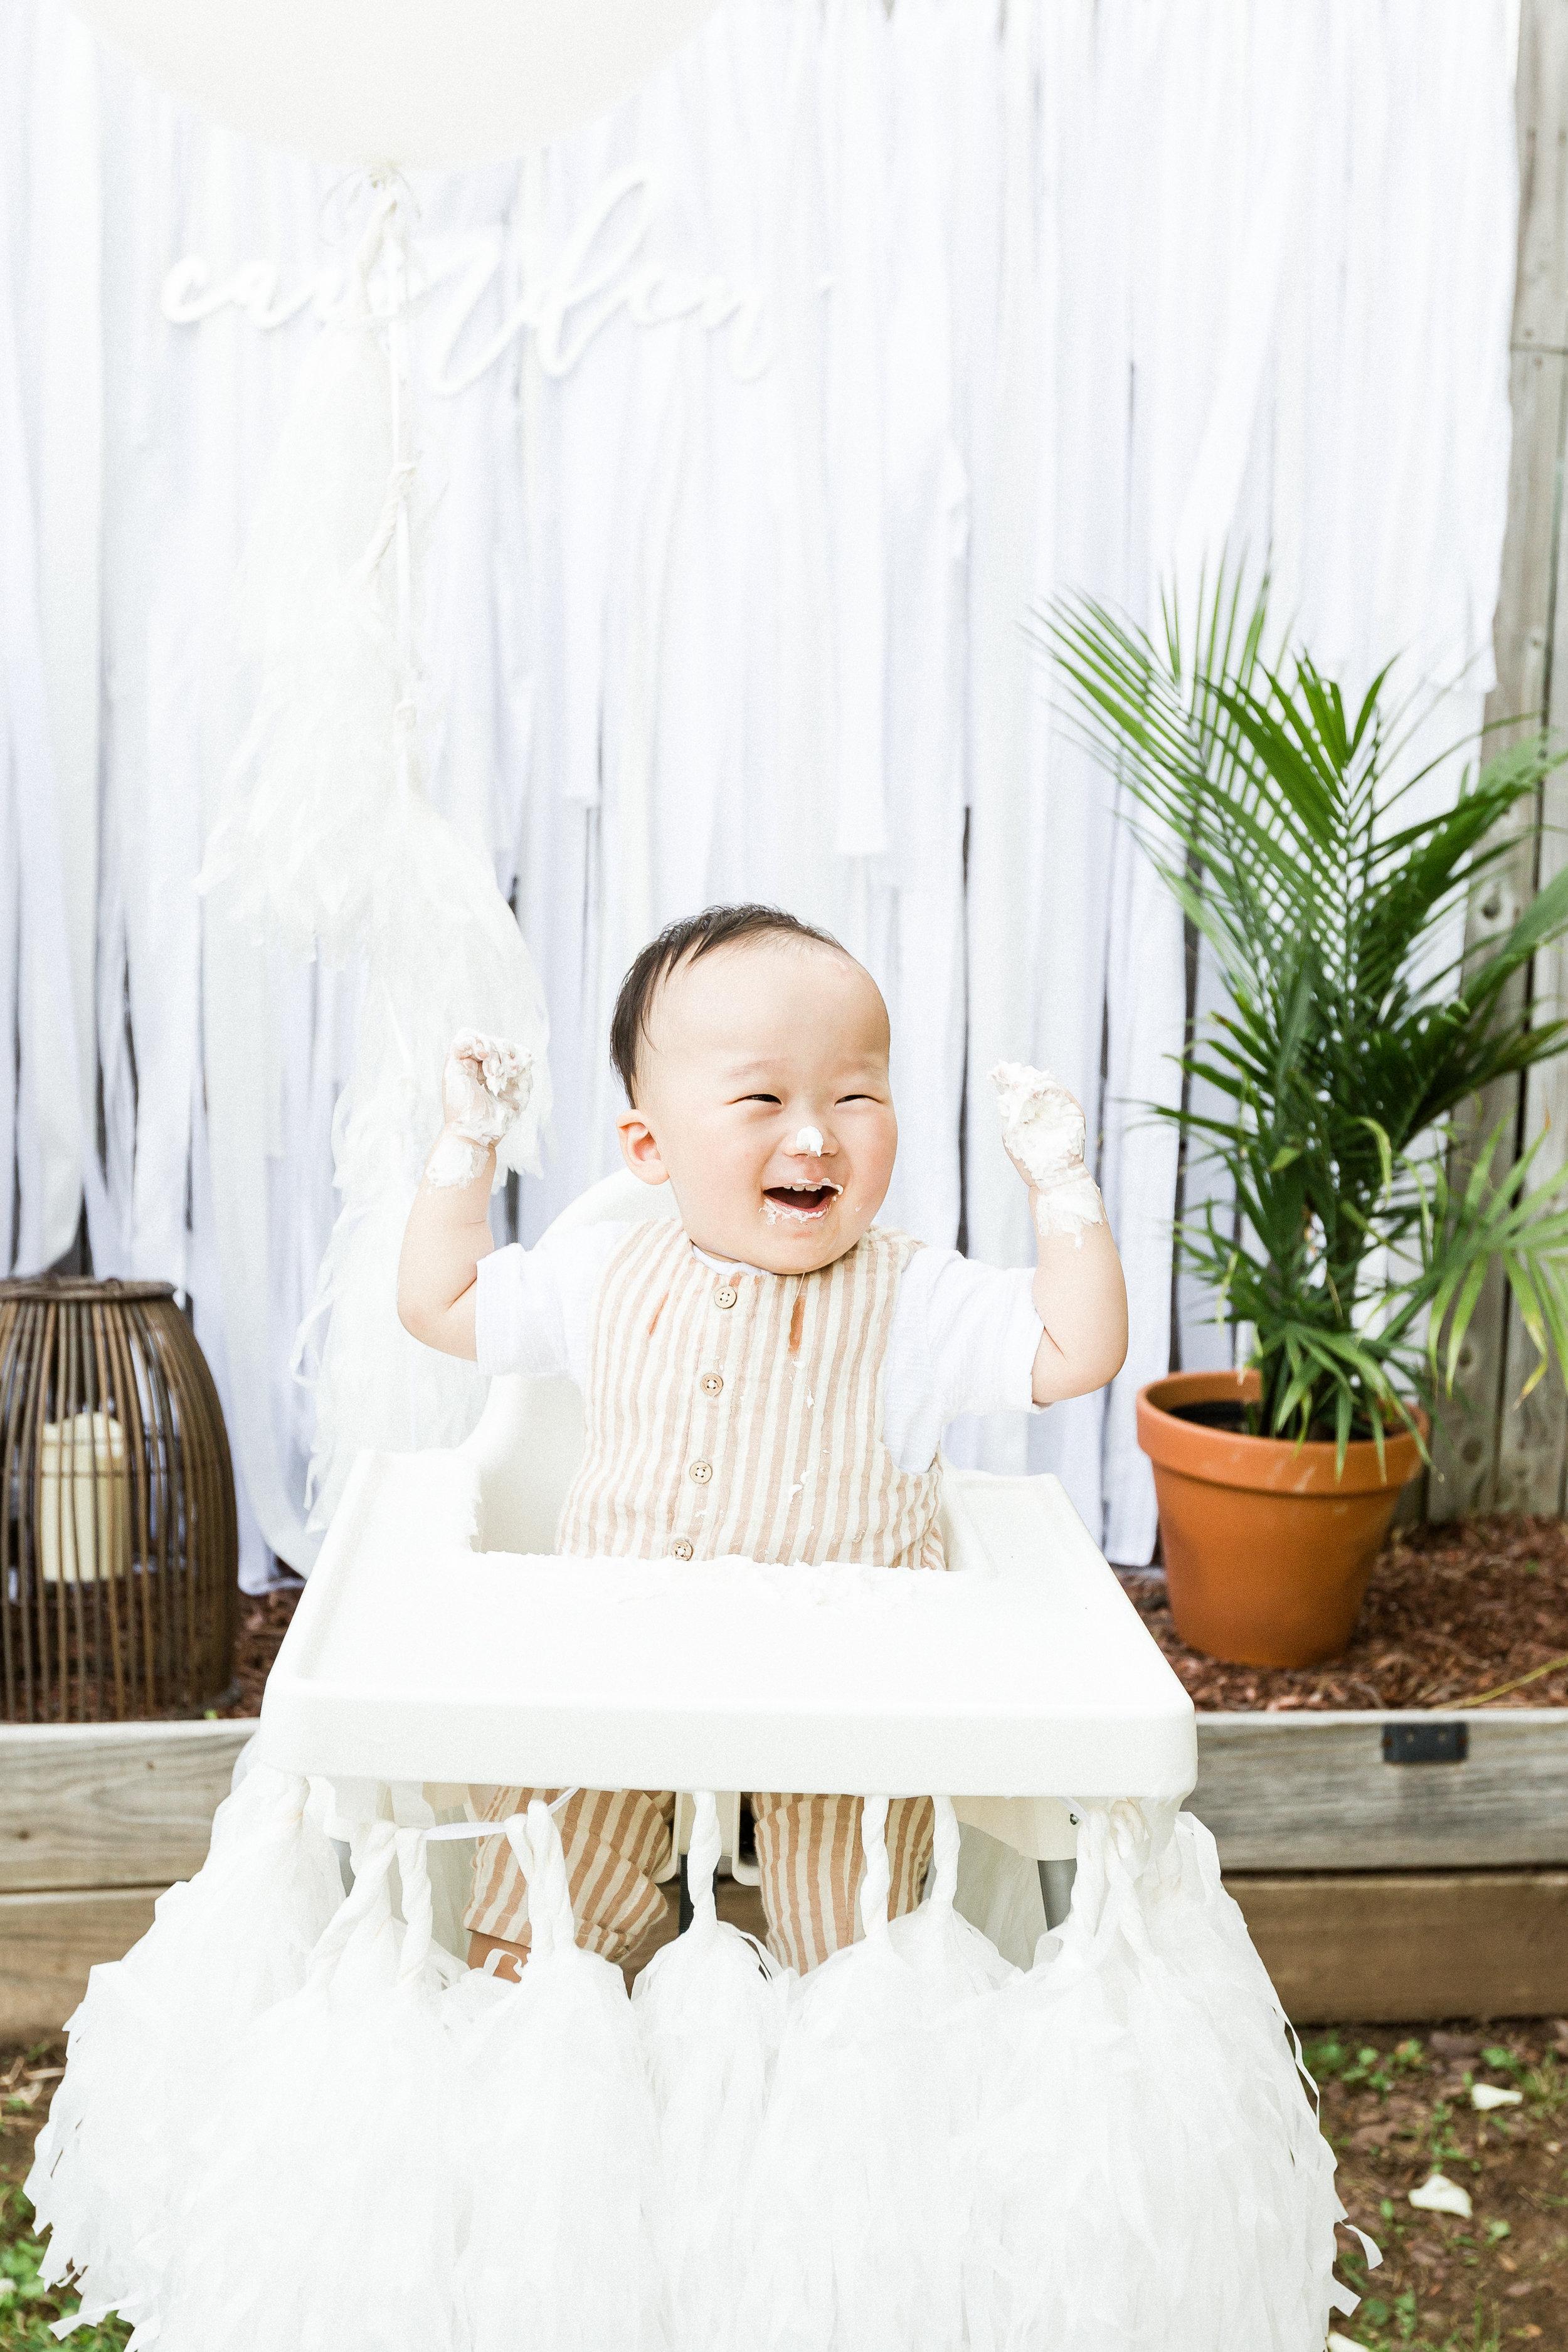 lissie-loomis-photo-nyc-family-photographer-brooklyn-baby61.JPG